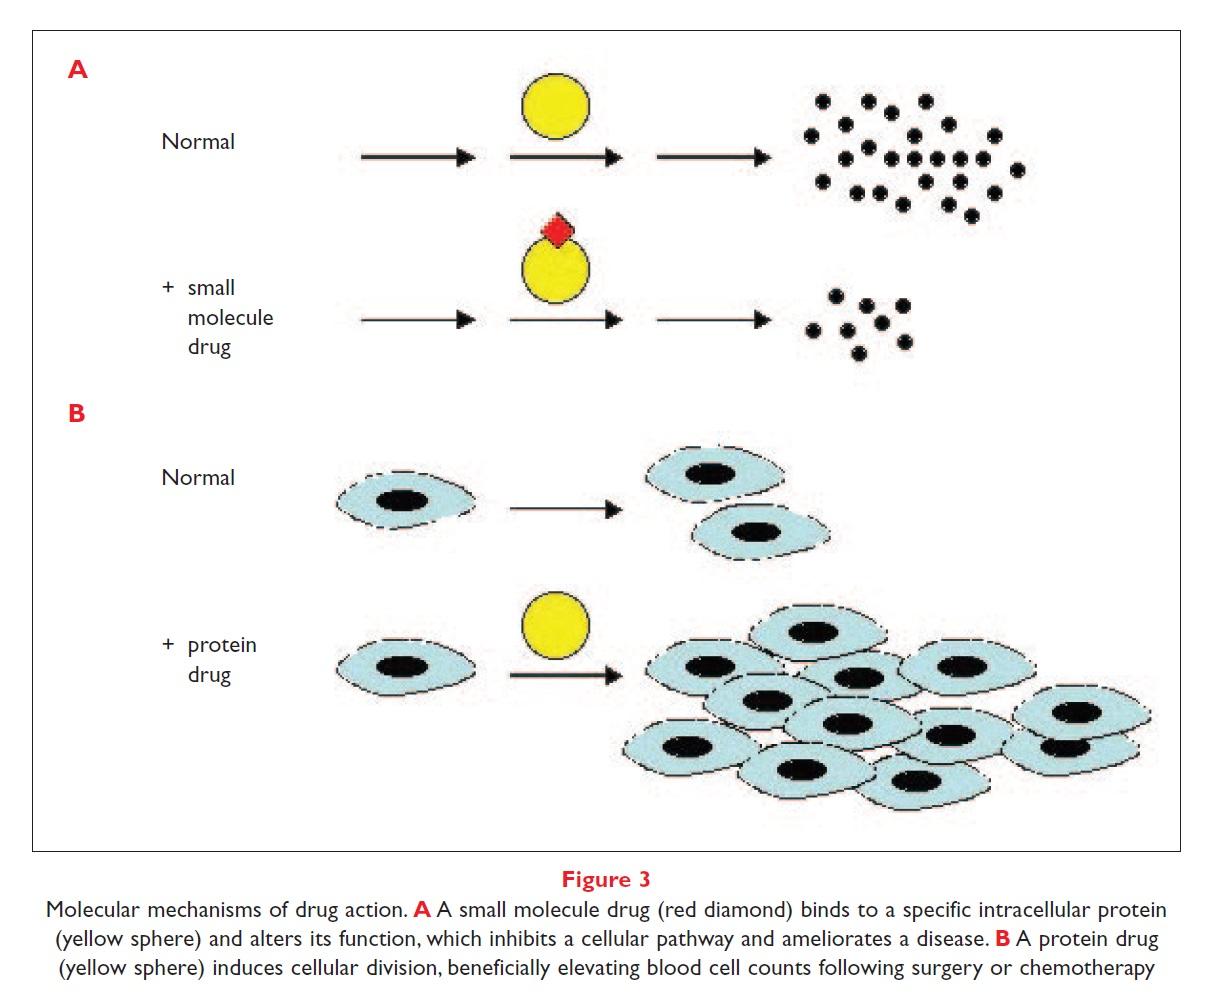 Figure 3 Molecular mechanisms of drug action